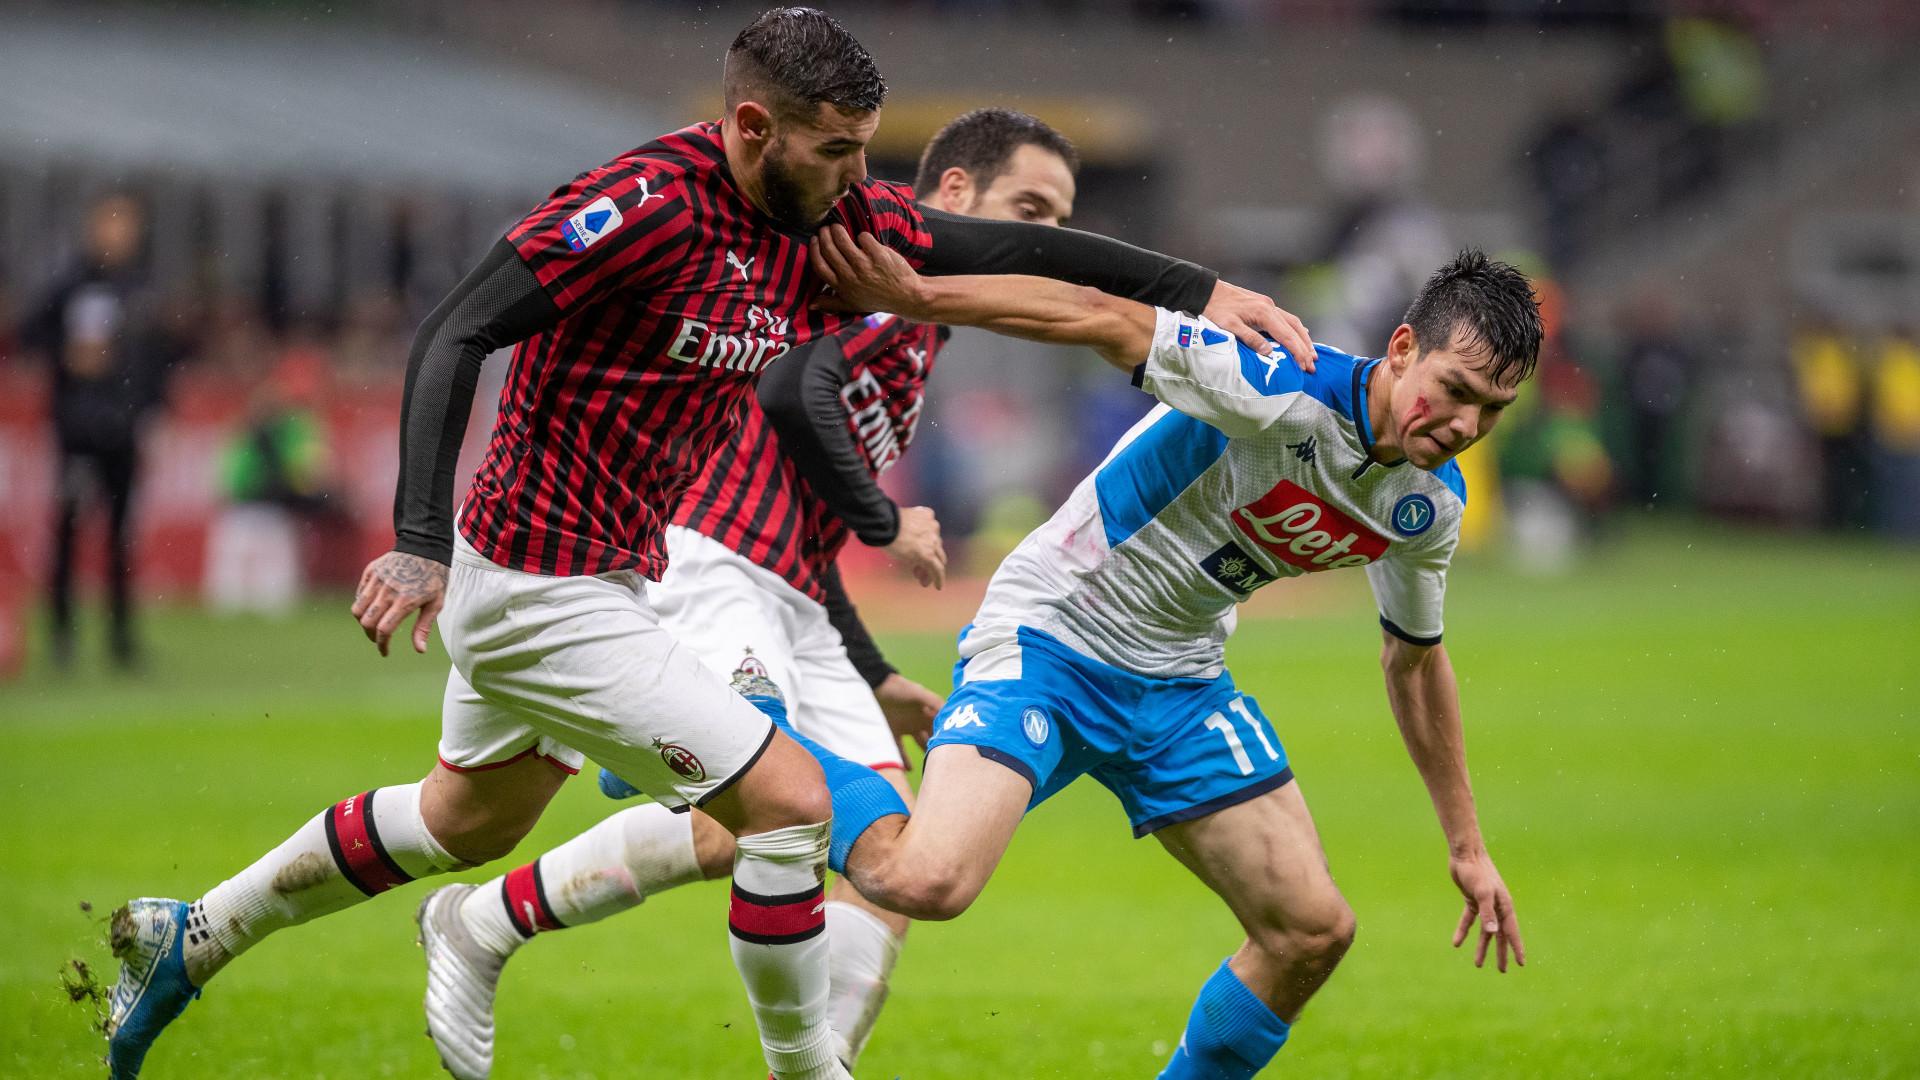 SSC Neapel Gegen AC Mailand Heute Live Im TV LIVE STREAM